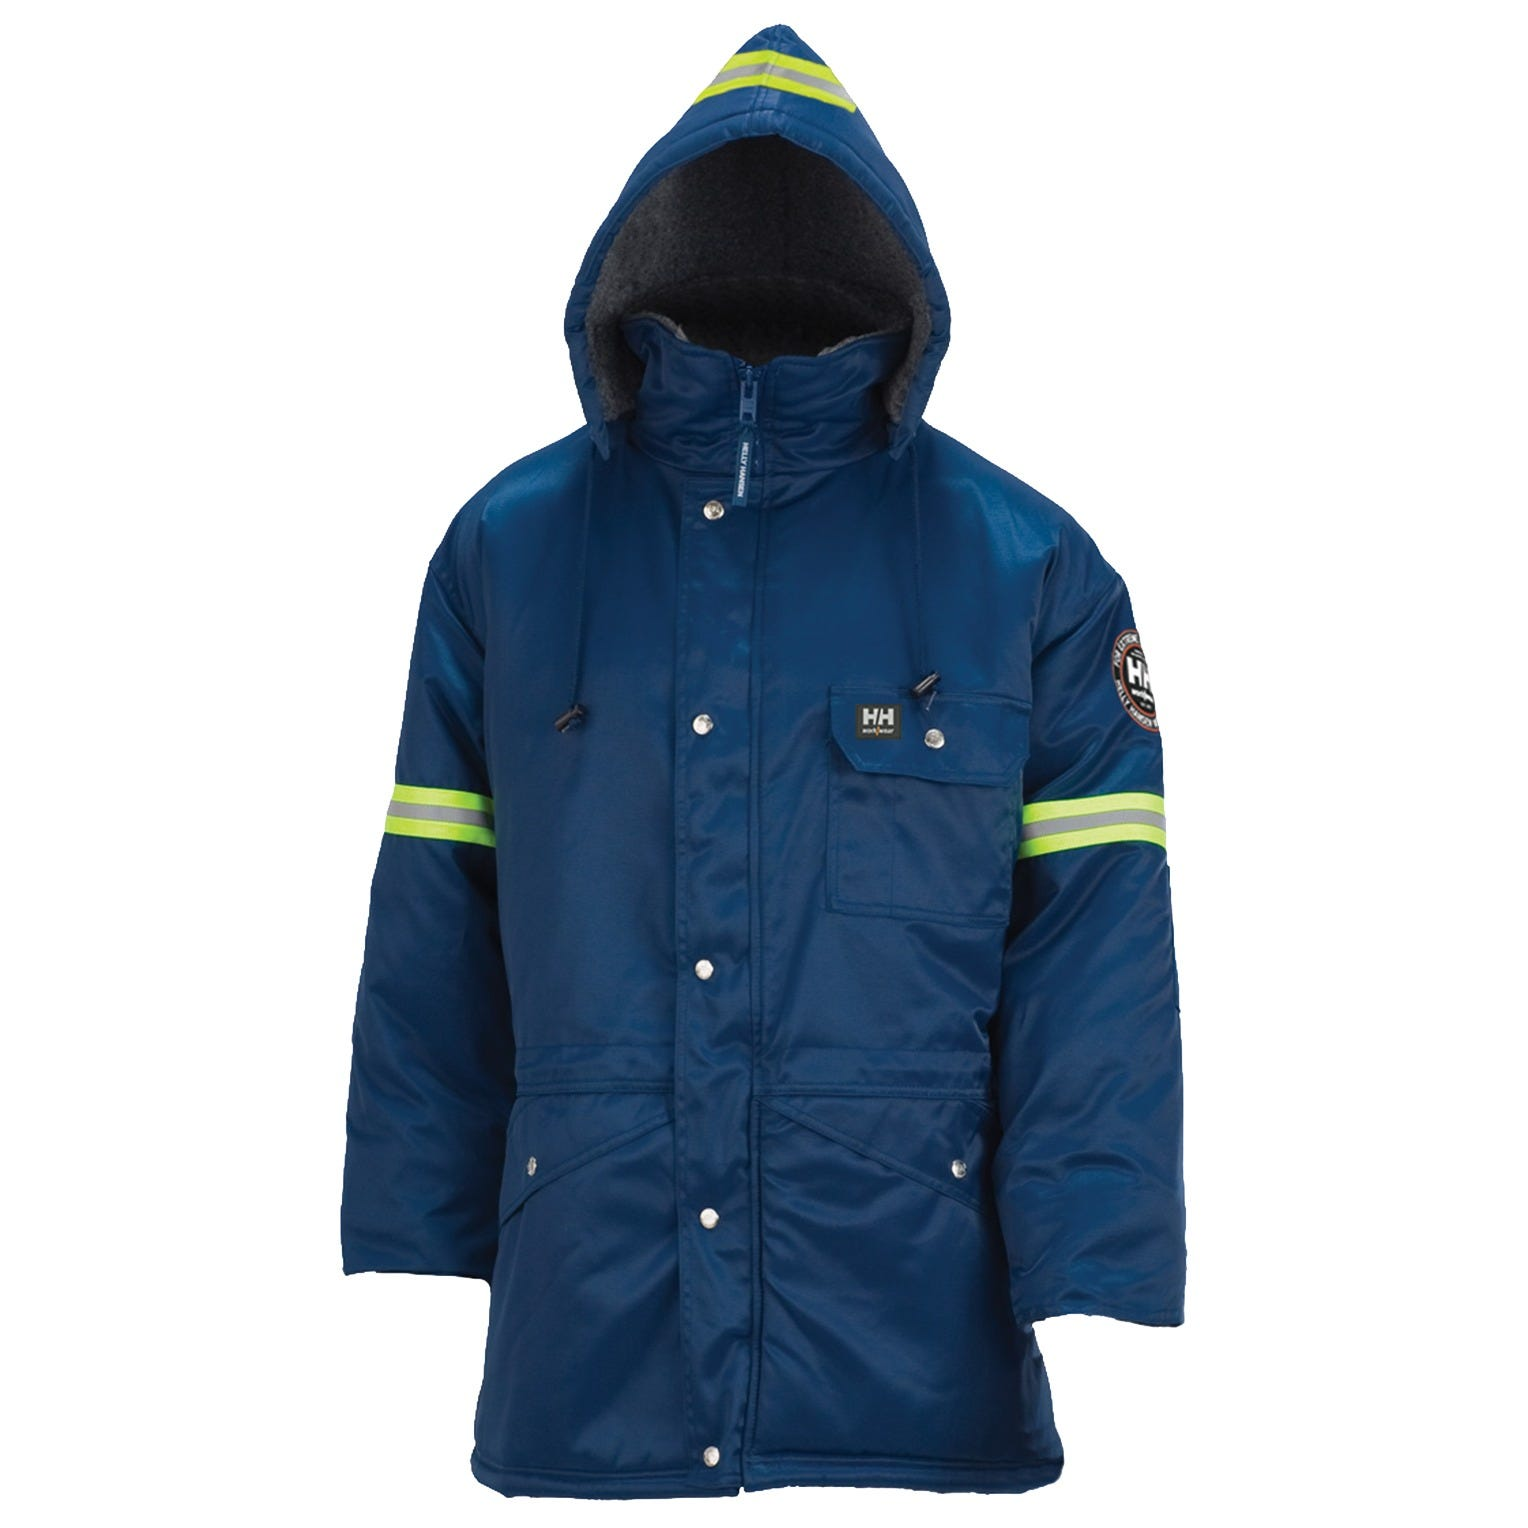 Helly Hansen Workwear Mens Thompson Reflective Parka Jacket Helly Hansen Men/'s Workwear 76312